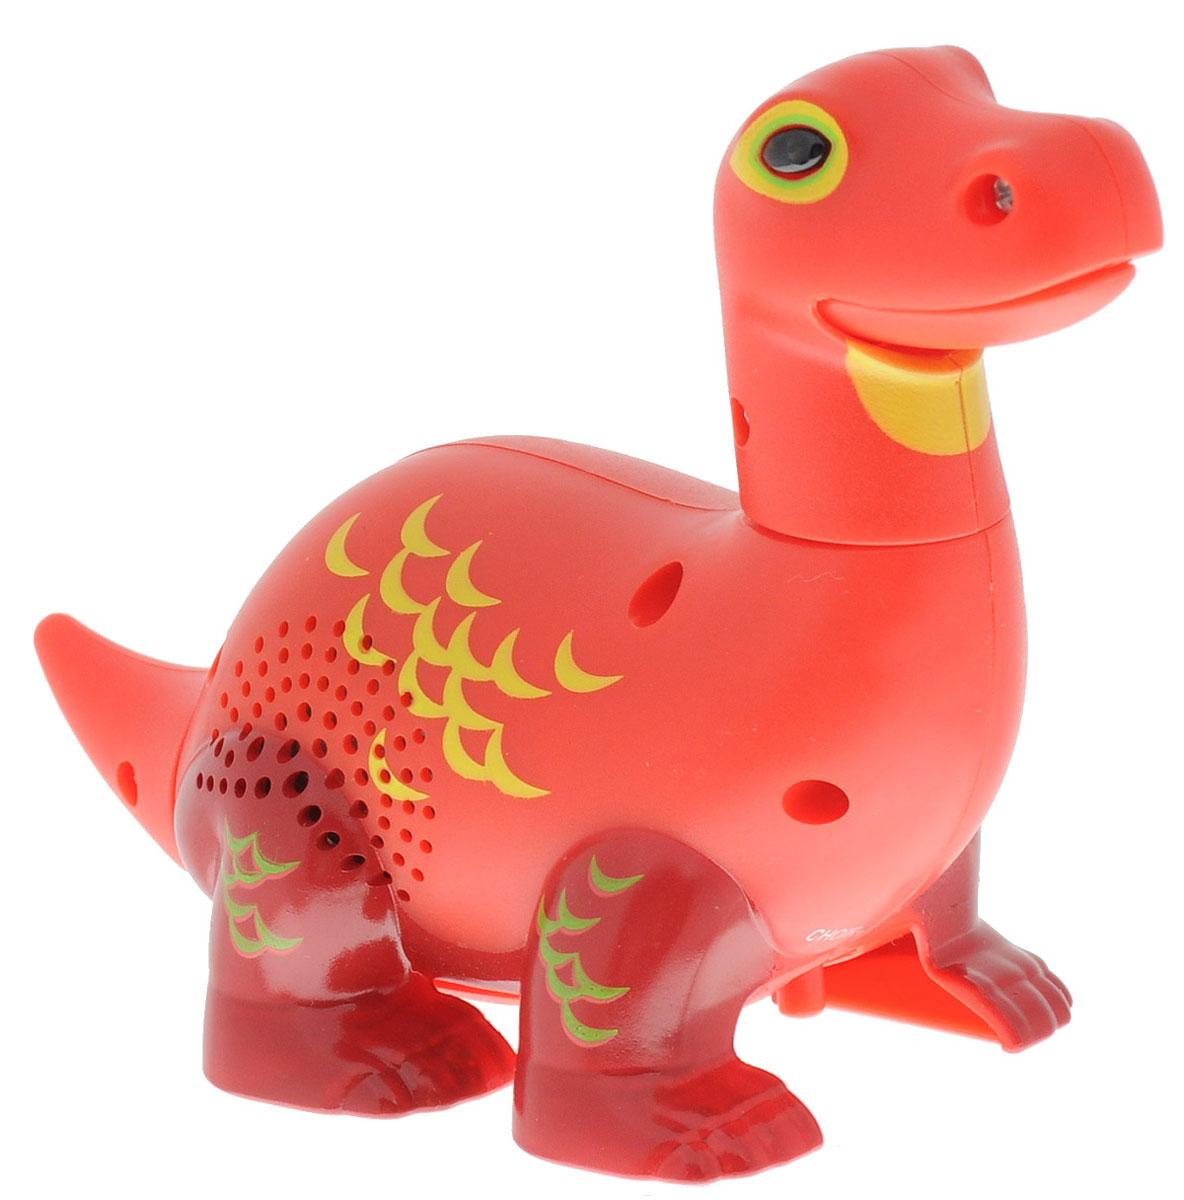 DigiFriends Интерактивная игрушка Динозавр Appolo роботы silverlit приручи динозавра белый